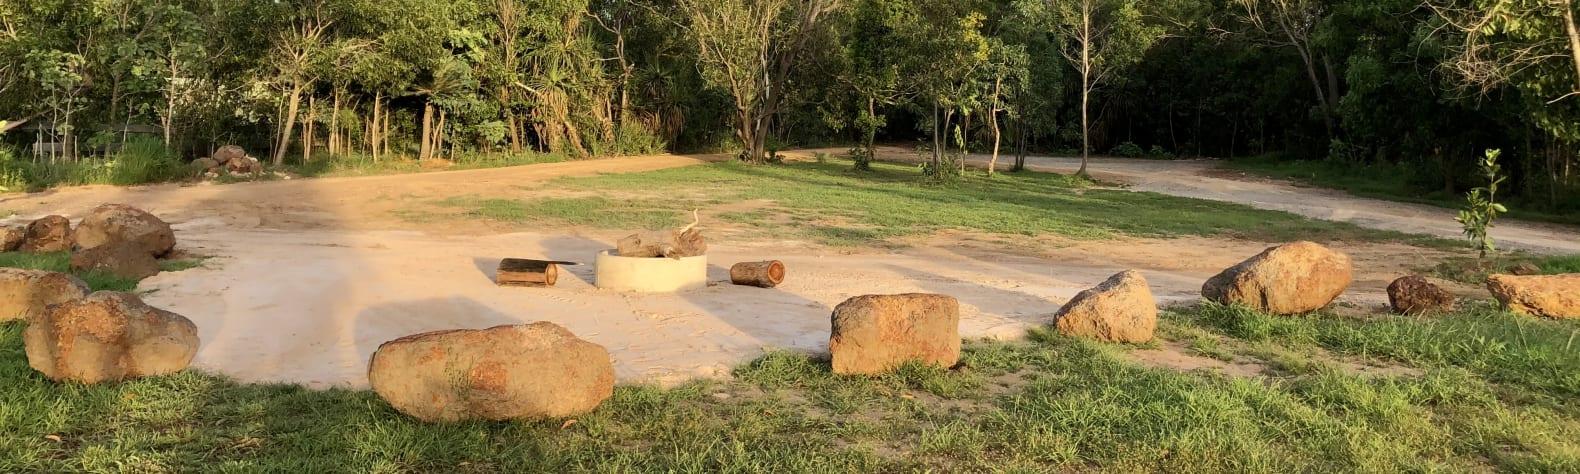 Kick Back & Relax Campsite